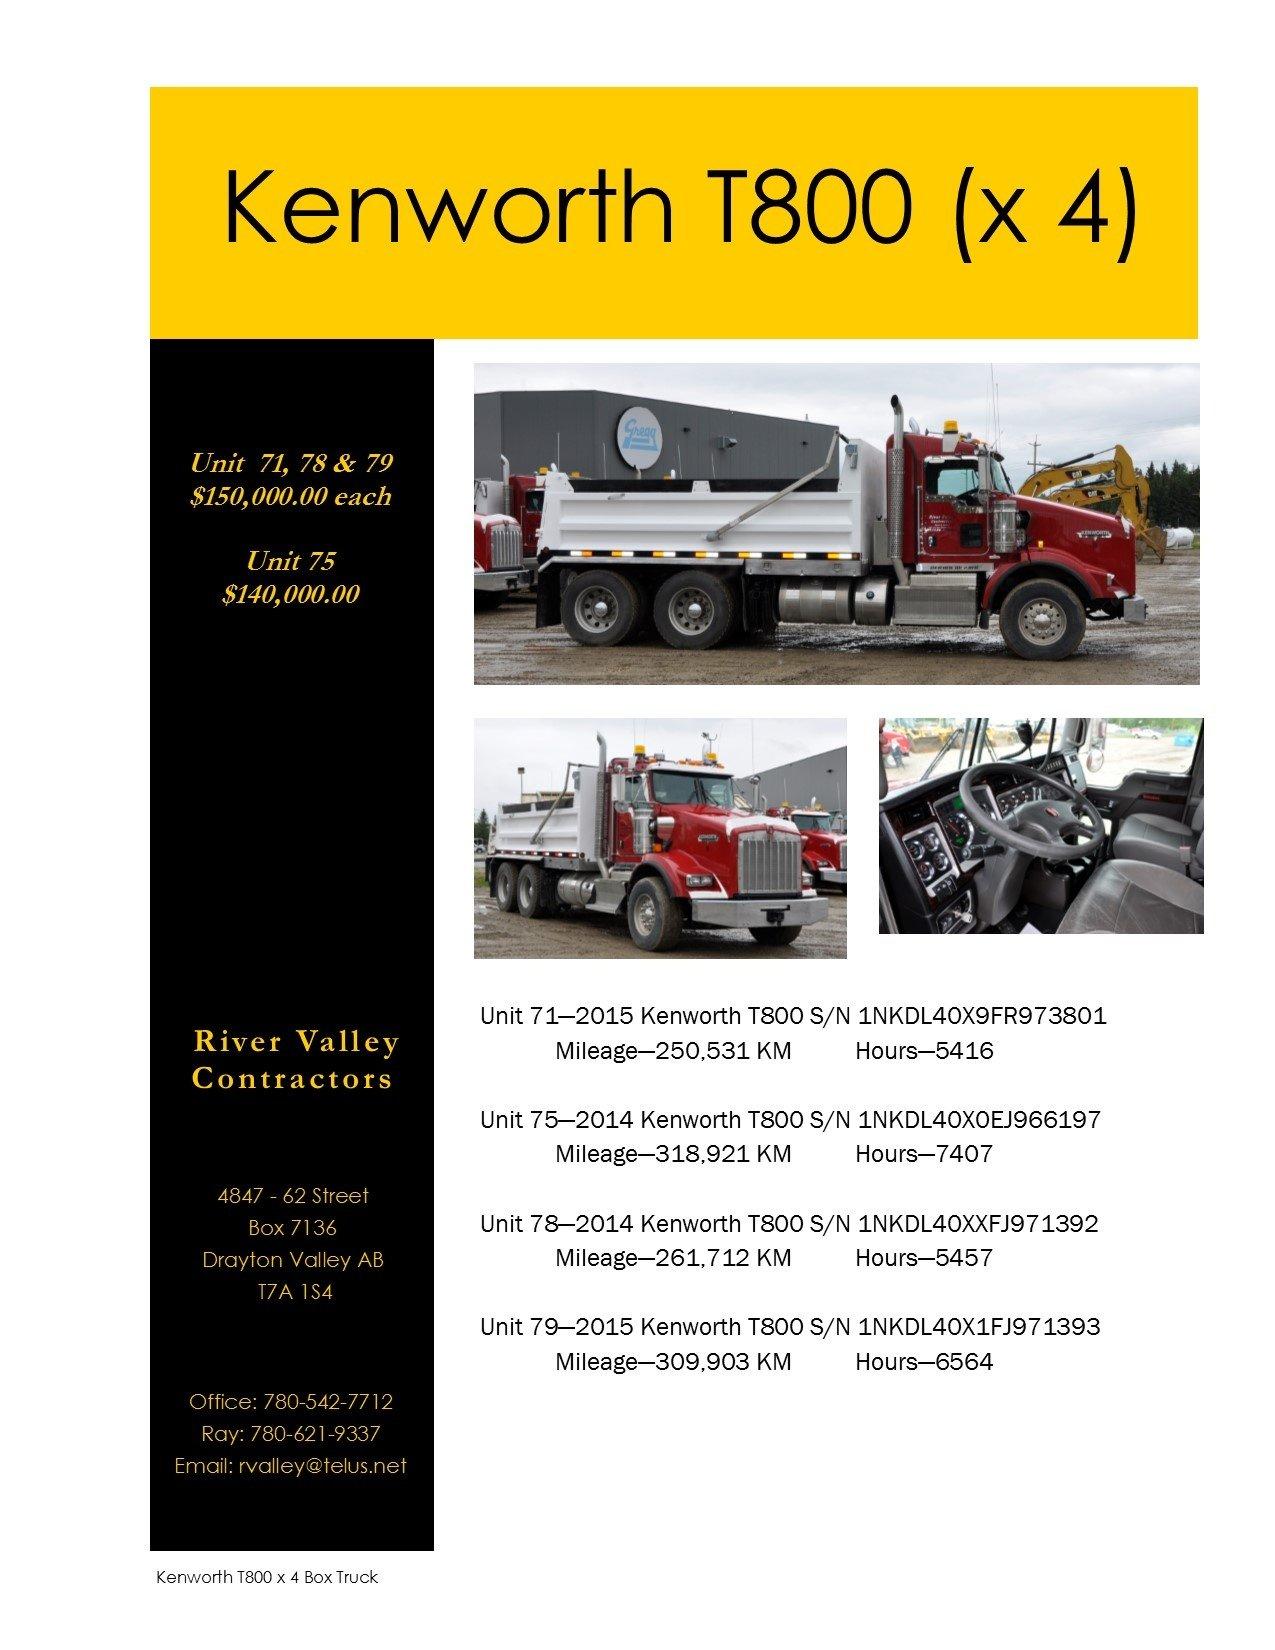 https://0901.nccdn.net/4_2/000/000/071/260/Kenworth-T800-x-4-Box-Truck-1275x1650.jpg